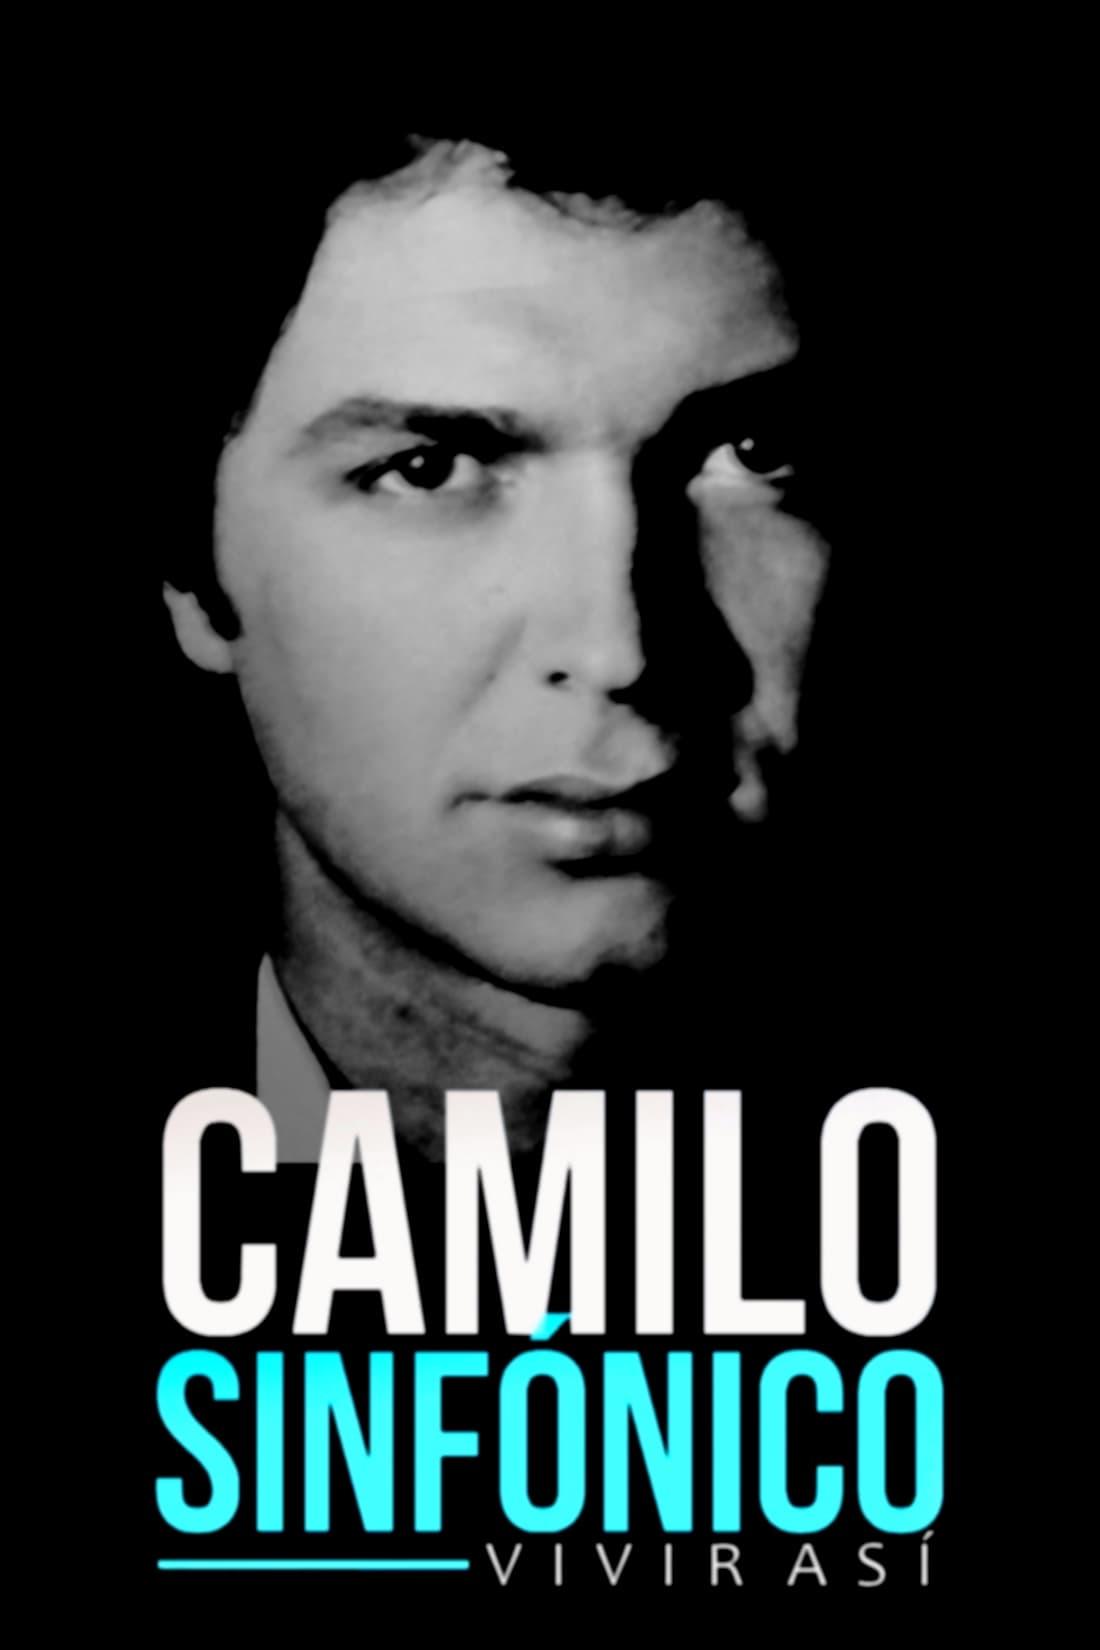 Camilo sinfónico: vivir así